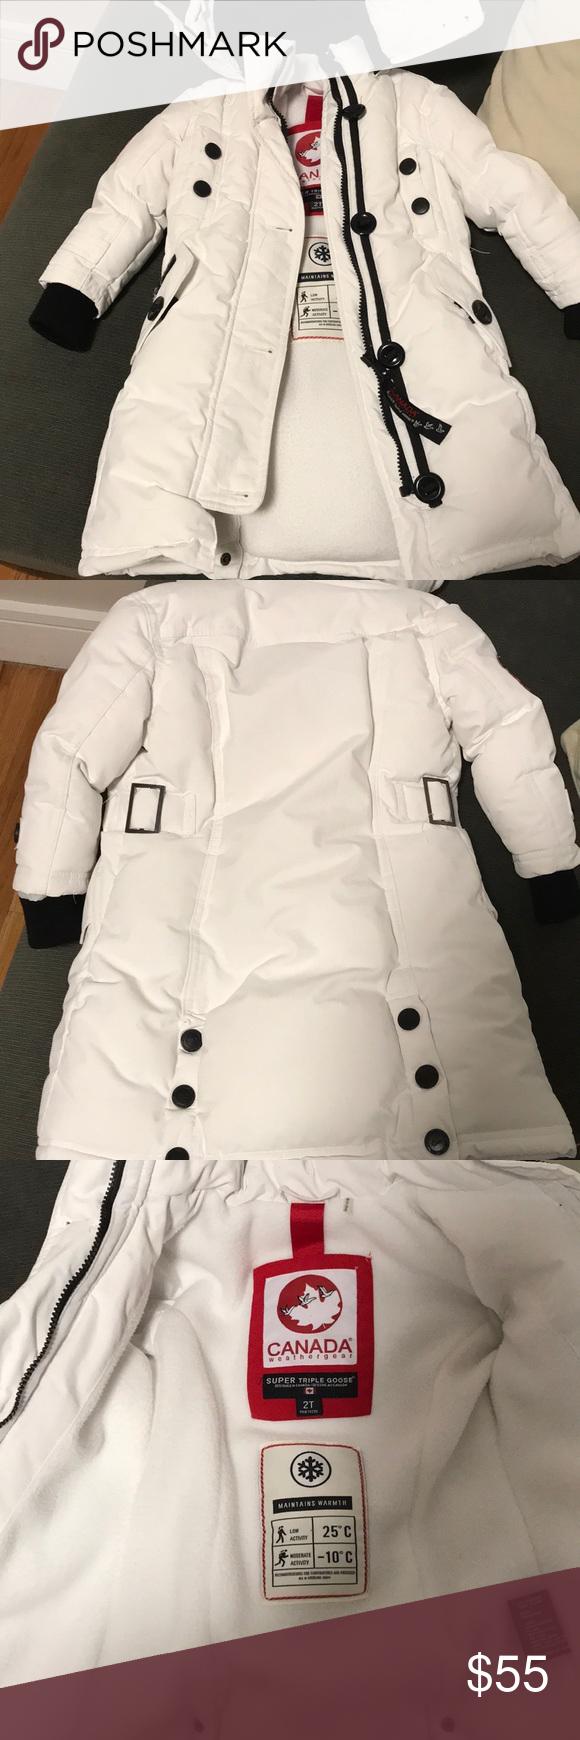 Canada Weather Gear Coat Clothes Design Fashion Trends Coat